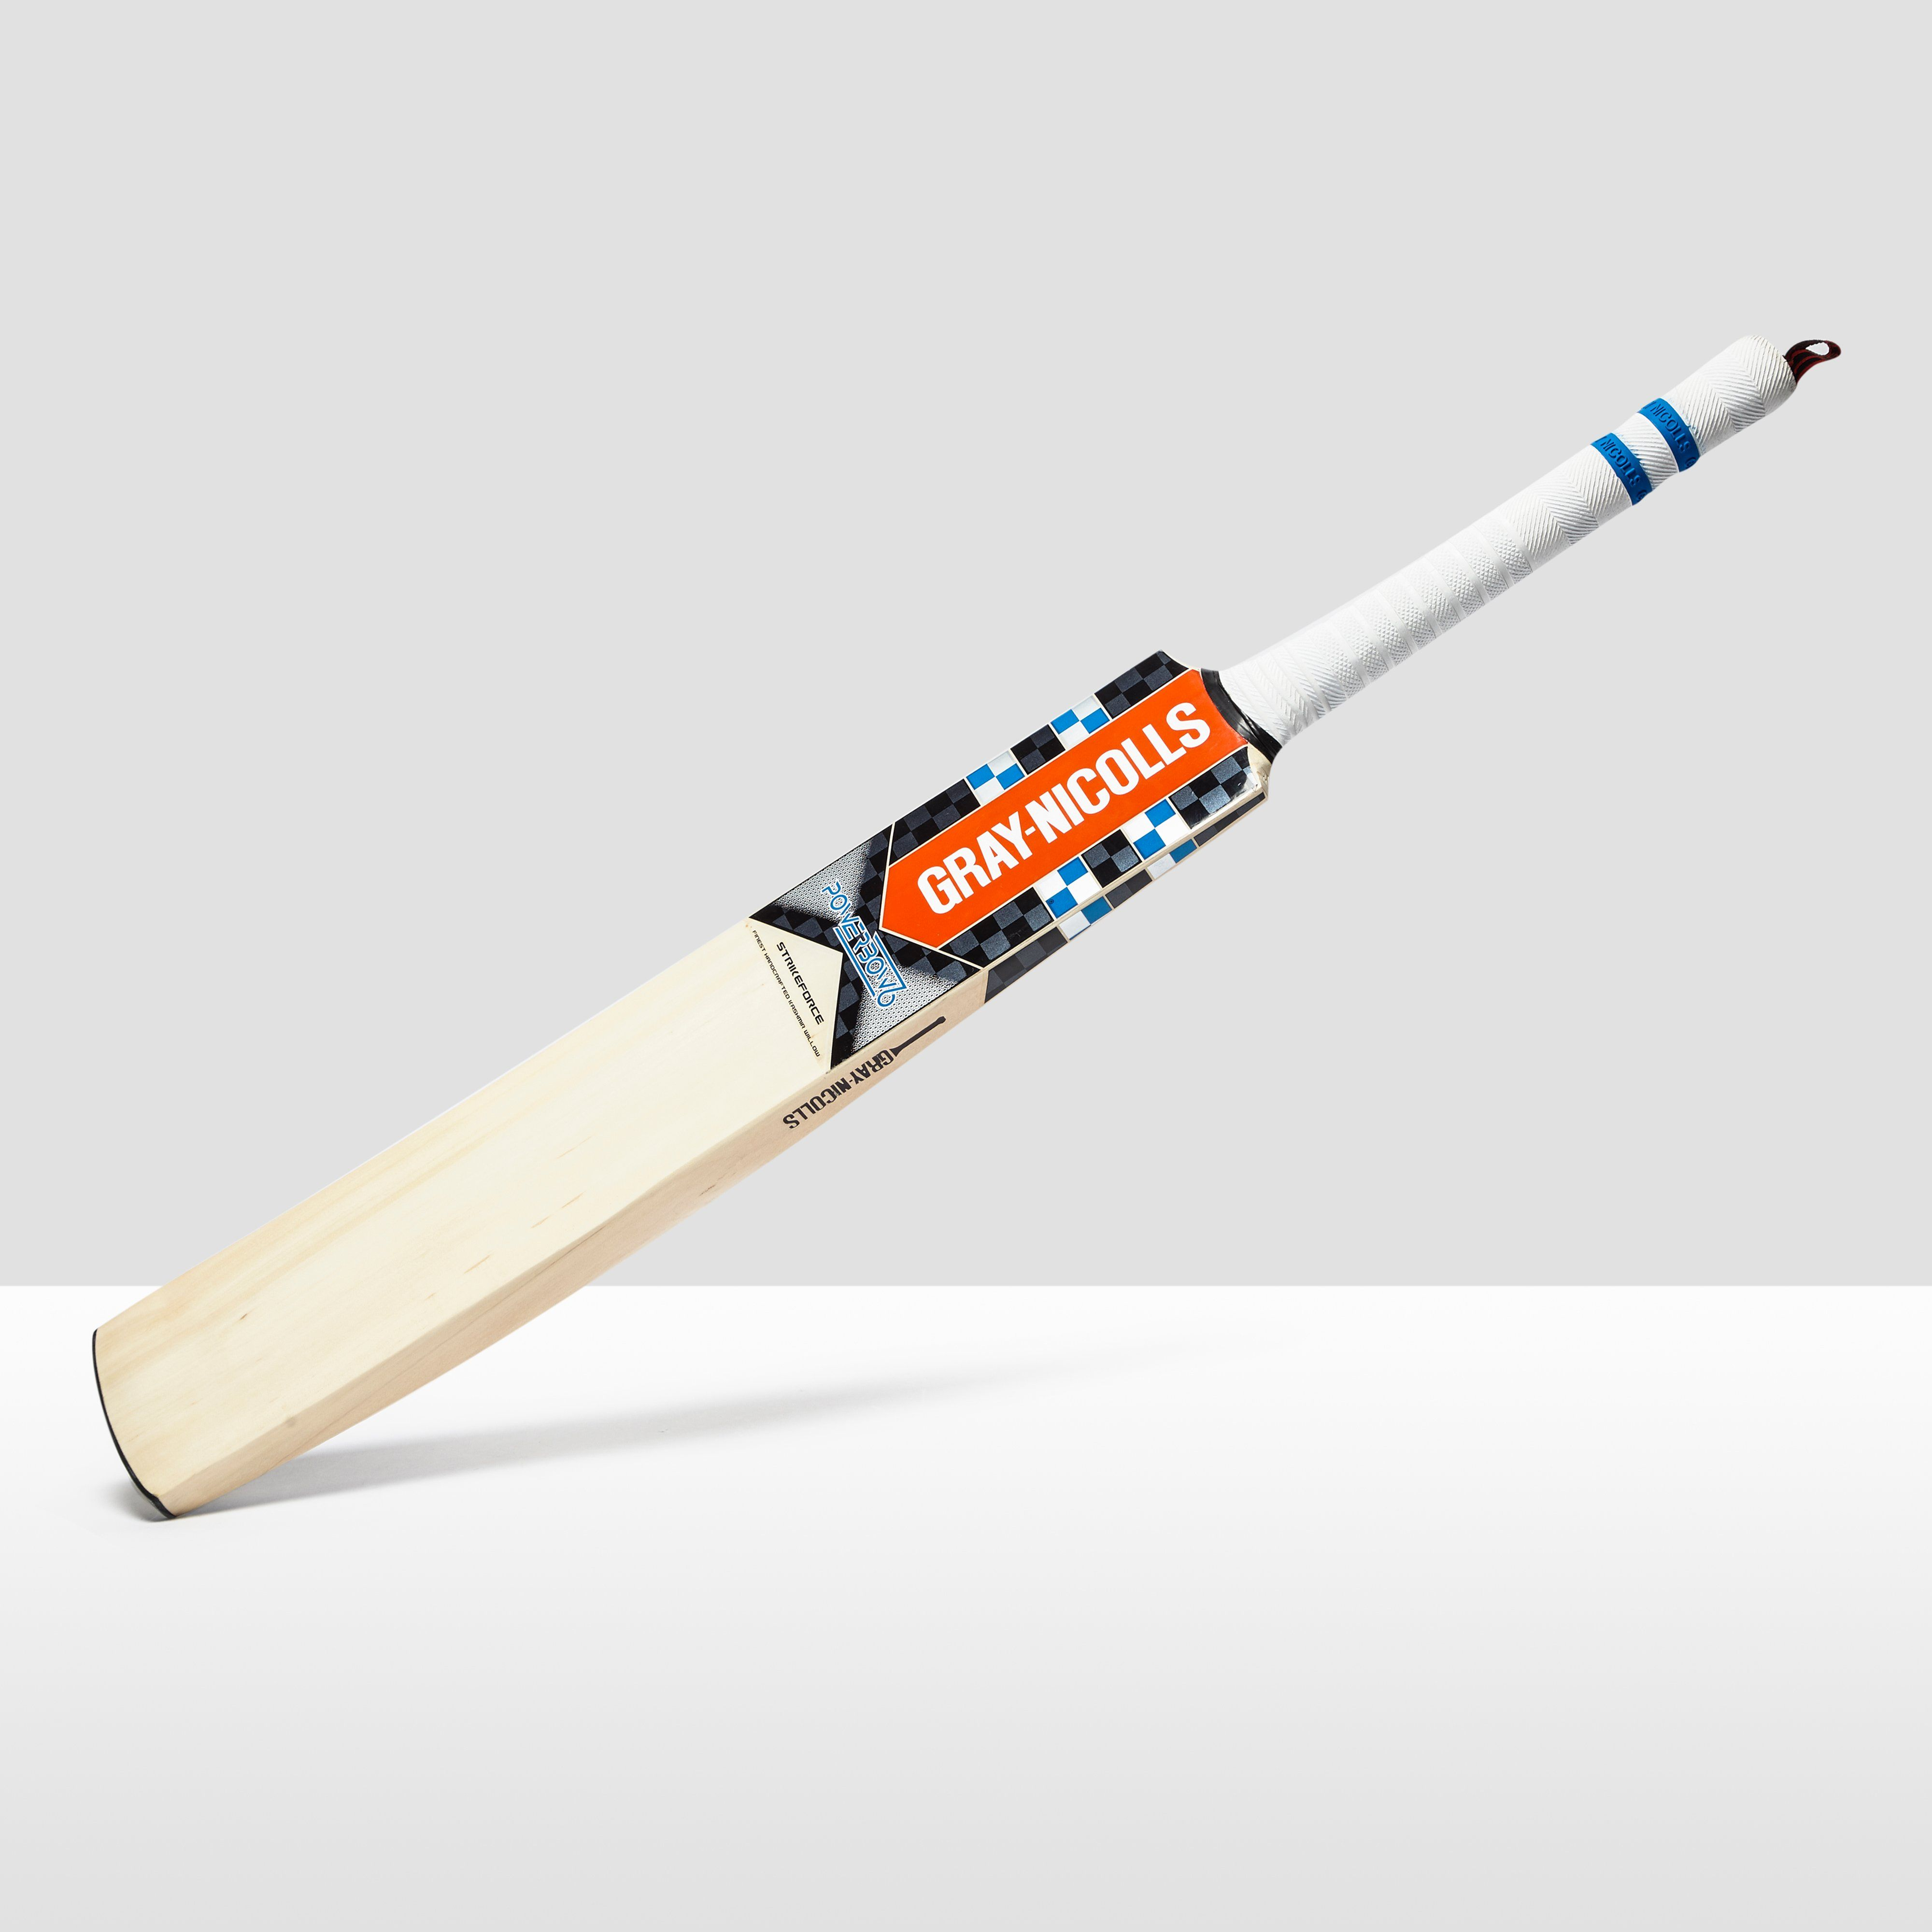 Gray-Nicolls Powerbow 6 1000 Junior Cricket Bat